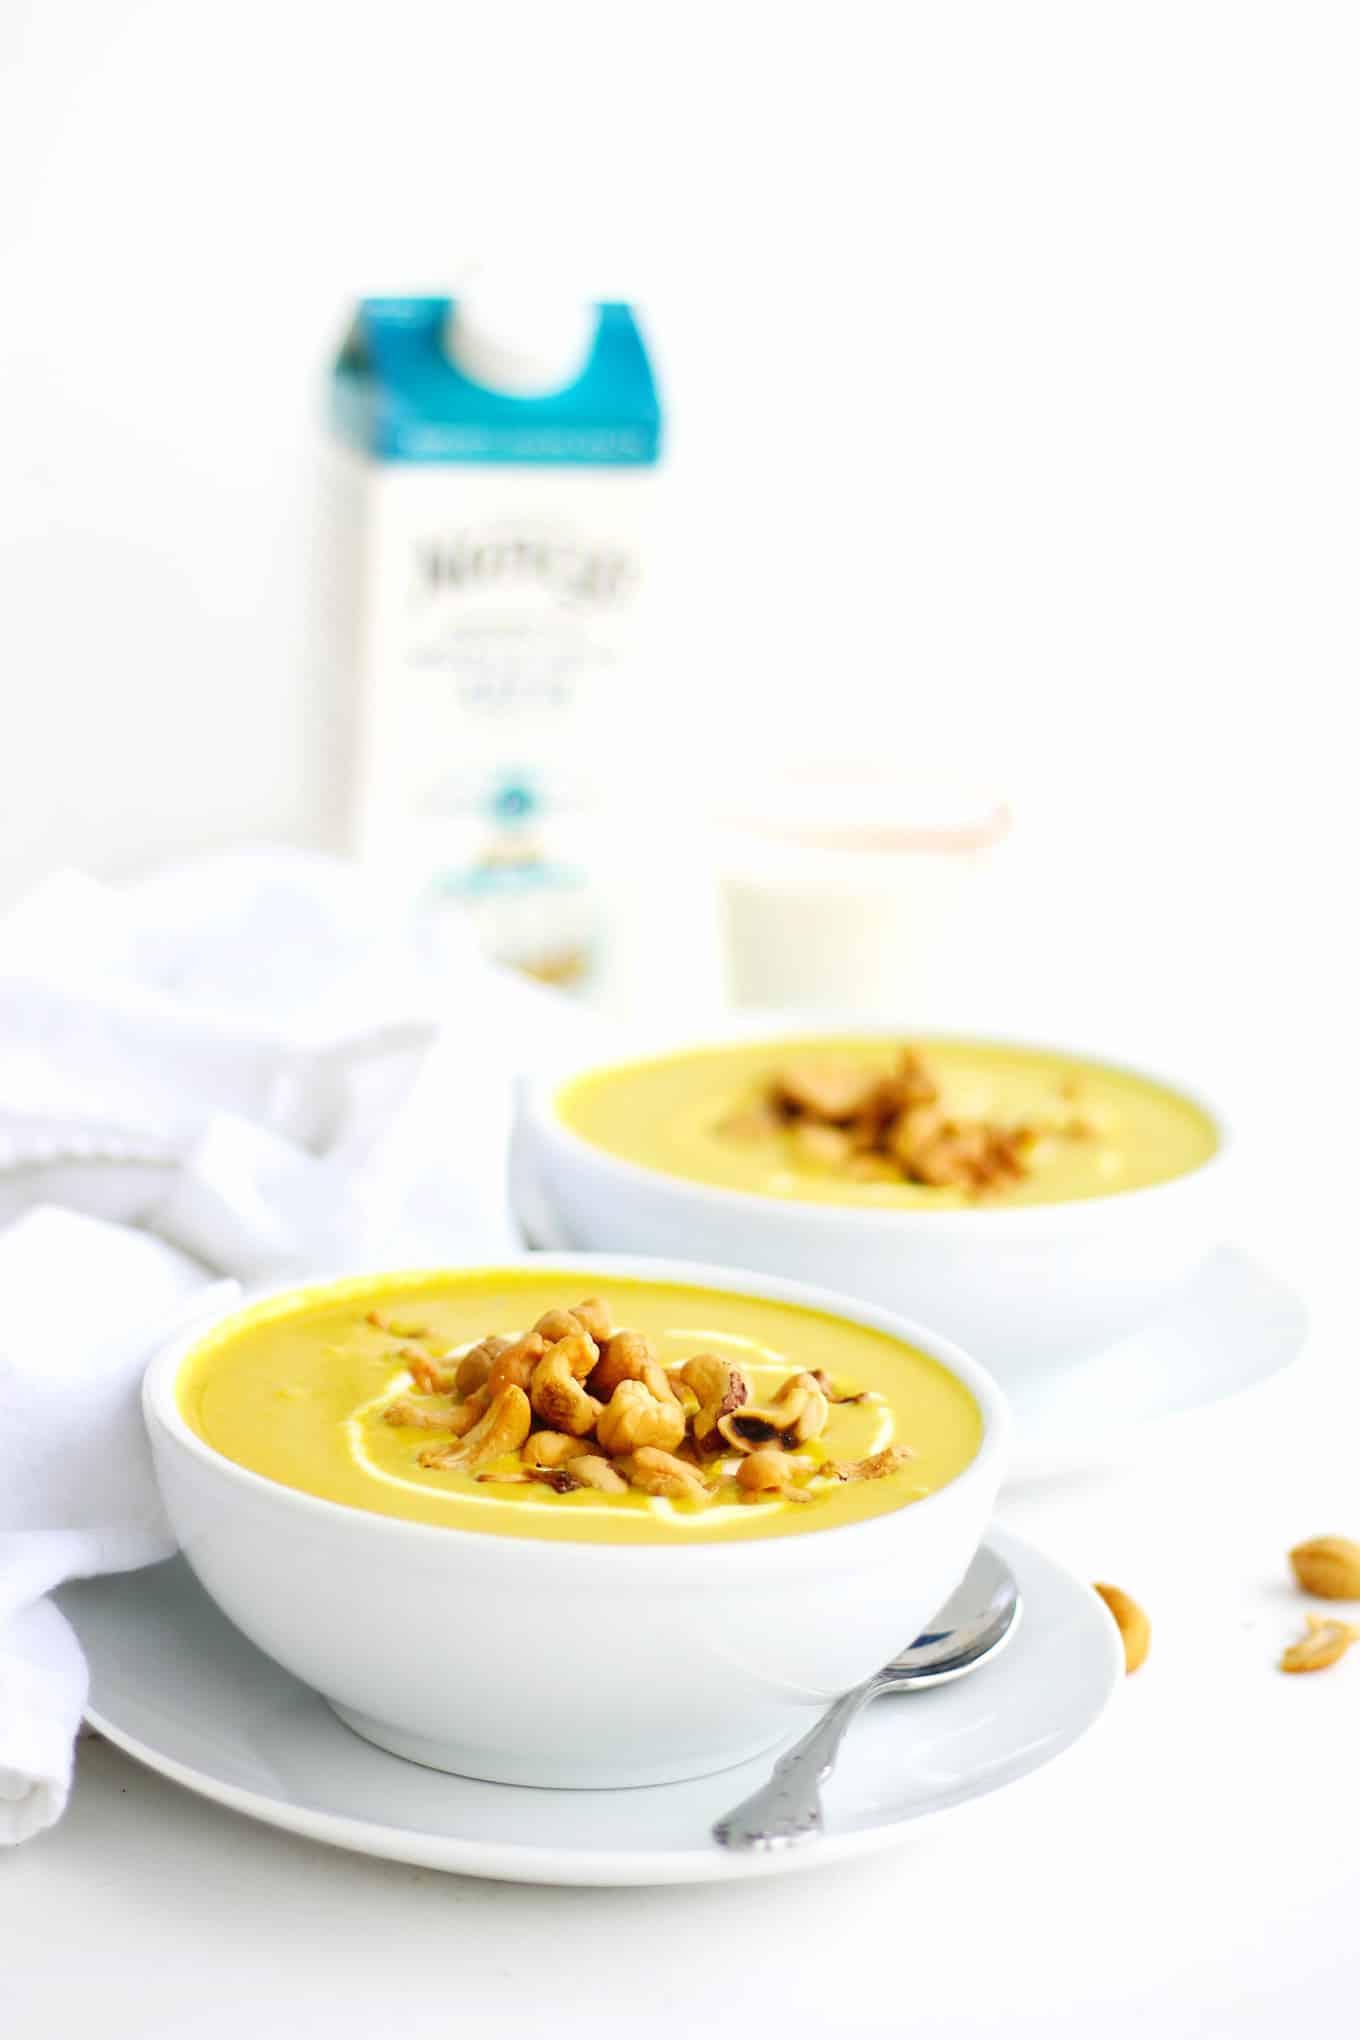 Coconut cauliflower golden soup with kefir recipe! A healing, turmeric golden milk soup with creamy cauliflower, sweet coconut, and tangy kefir. // Rhubarbarians